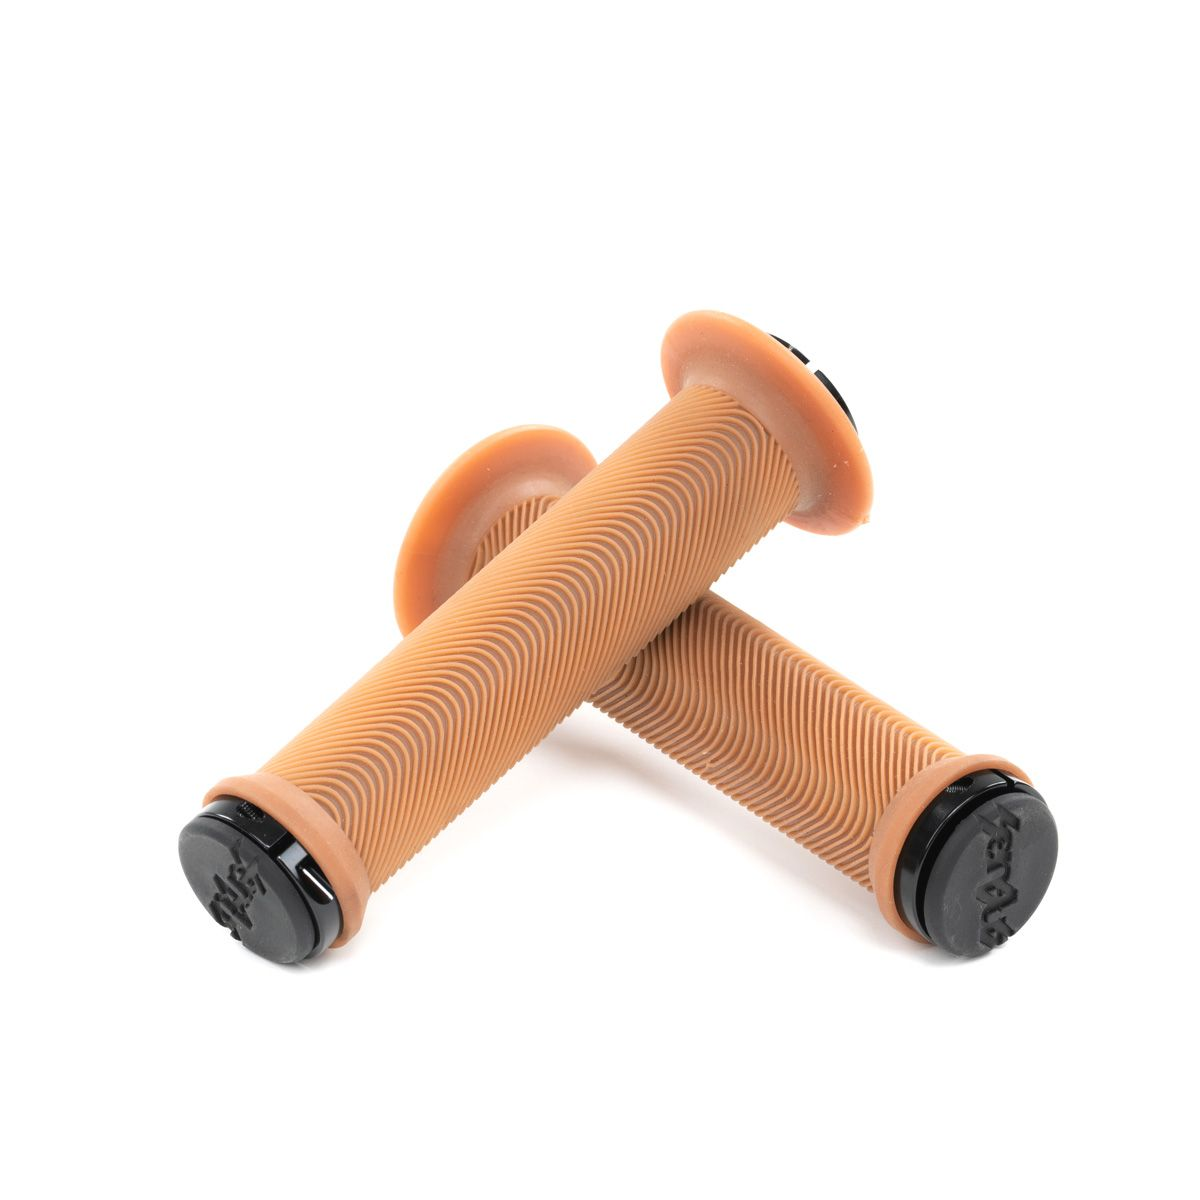 Gripy MTB ODI Sensus Swayze Lock-On Bonus Pack Gum Rubber